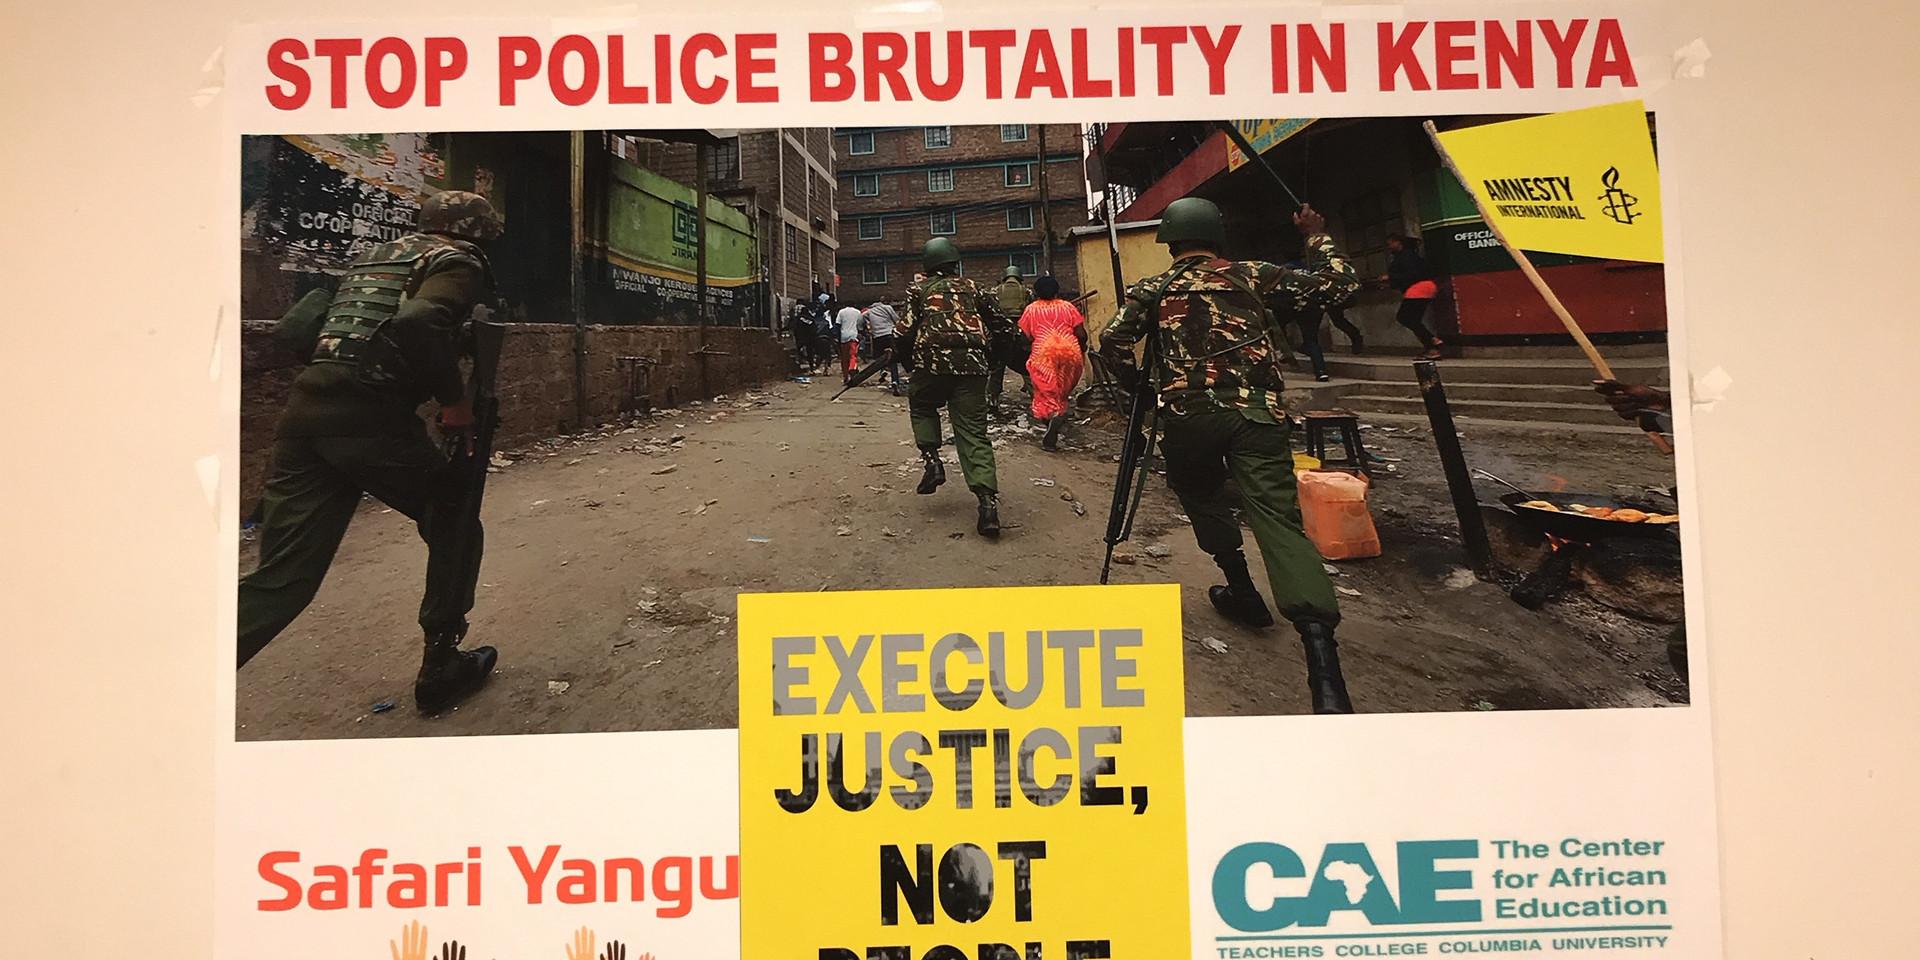 Write for Rights - Safari Yangu Against Police Brutality in Kenya